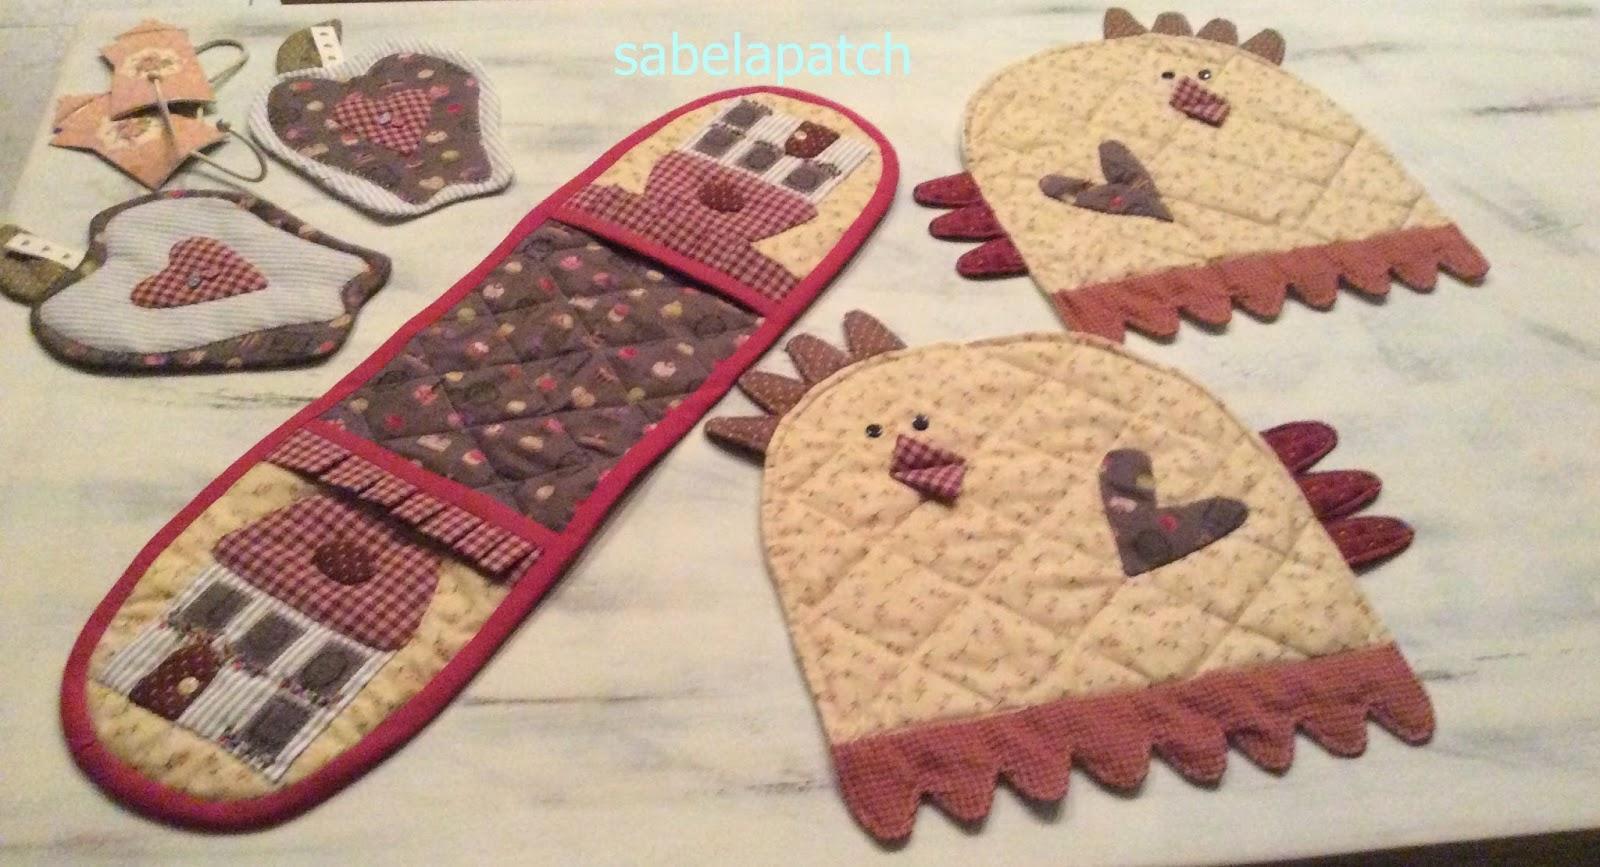 Sabela patchwork regalos para mi hermana pili for Regalos para hermanas